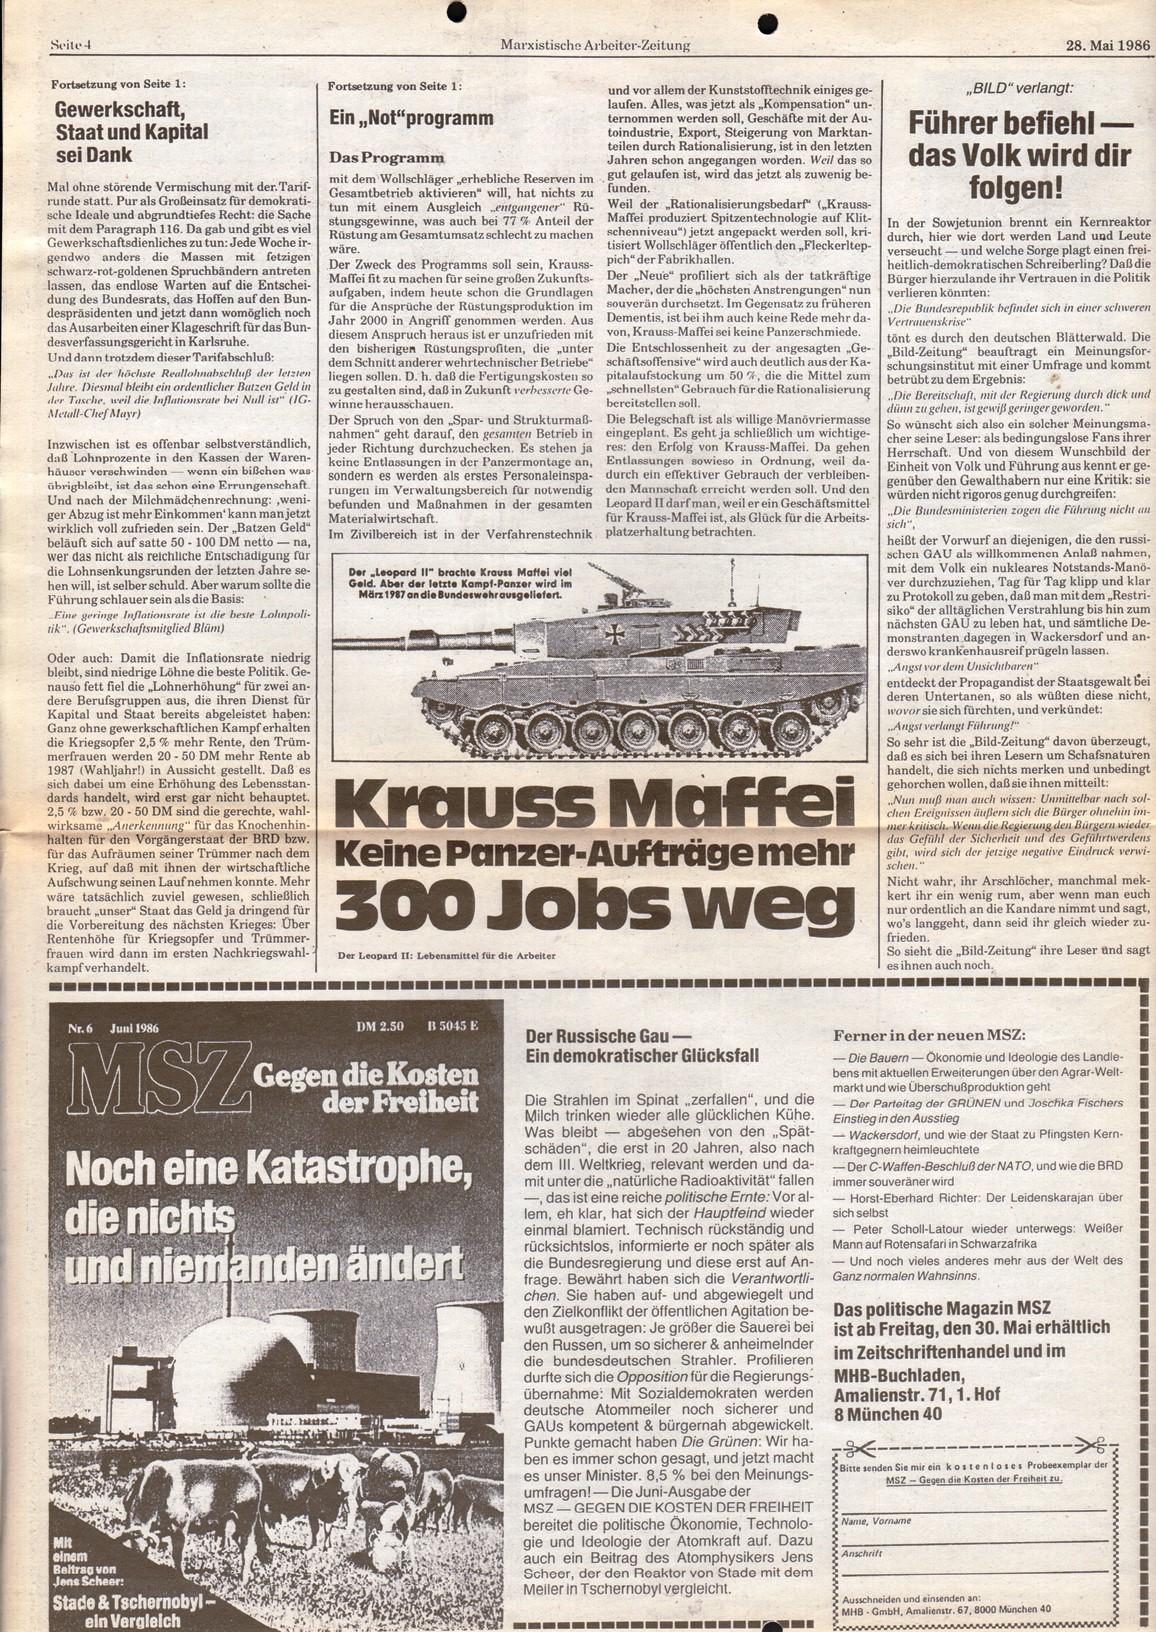 Muenchen_MG_MAZ_Krauss_Maffei_19860528_04